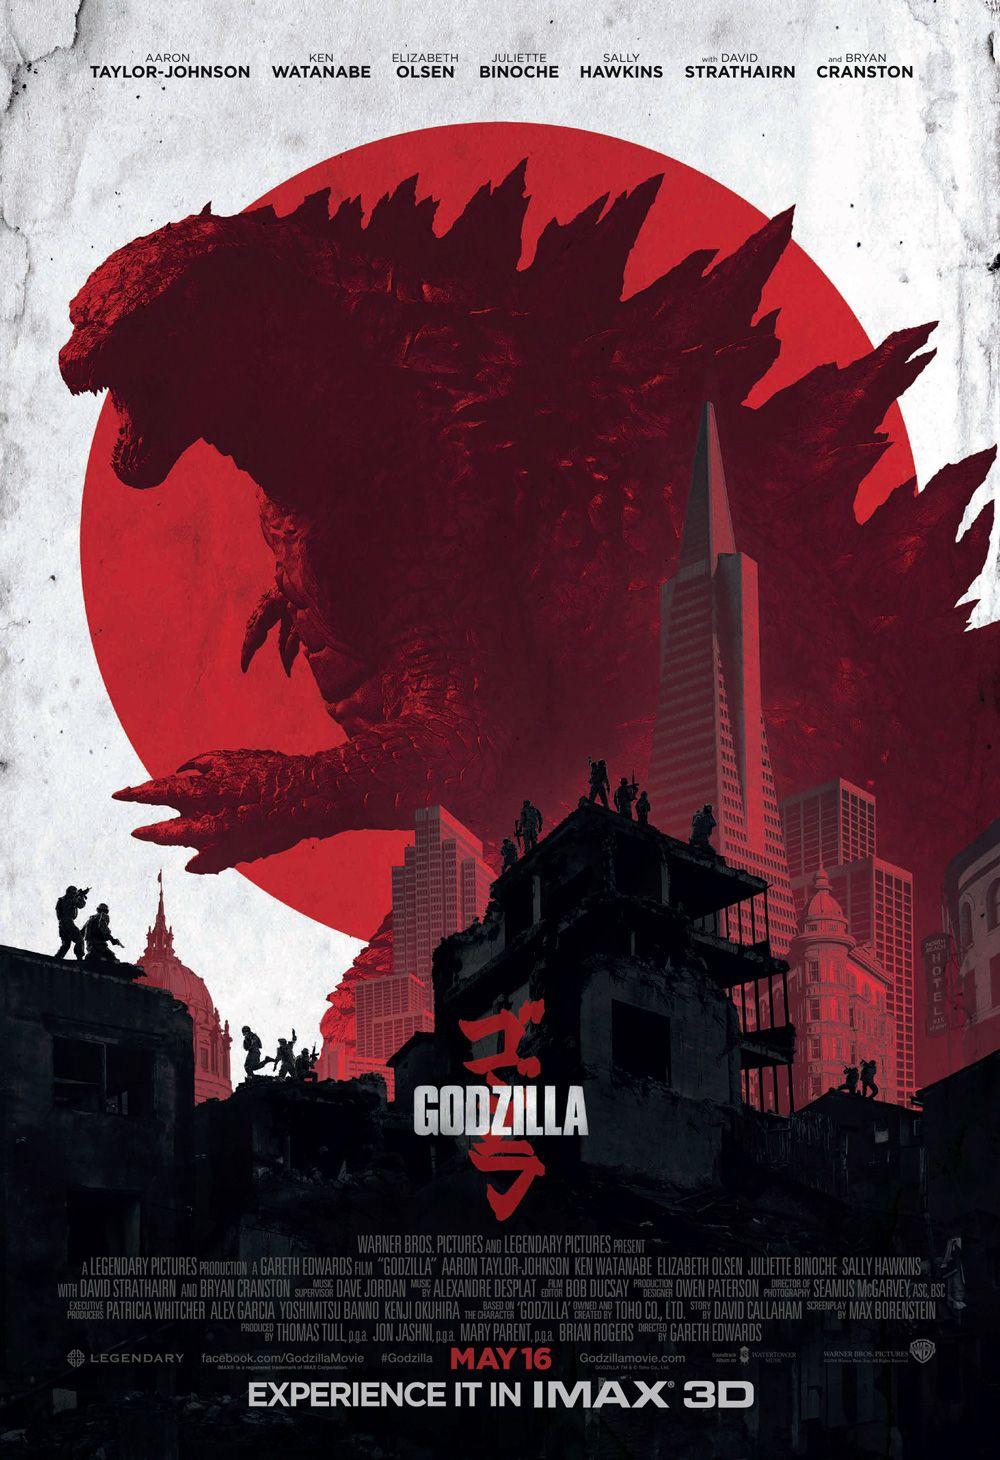 Godzilla 2 Release Date Set for June 8, 2018 | Collider